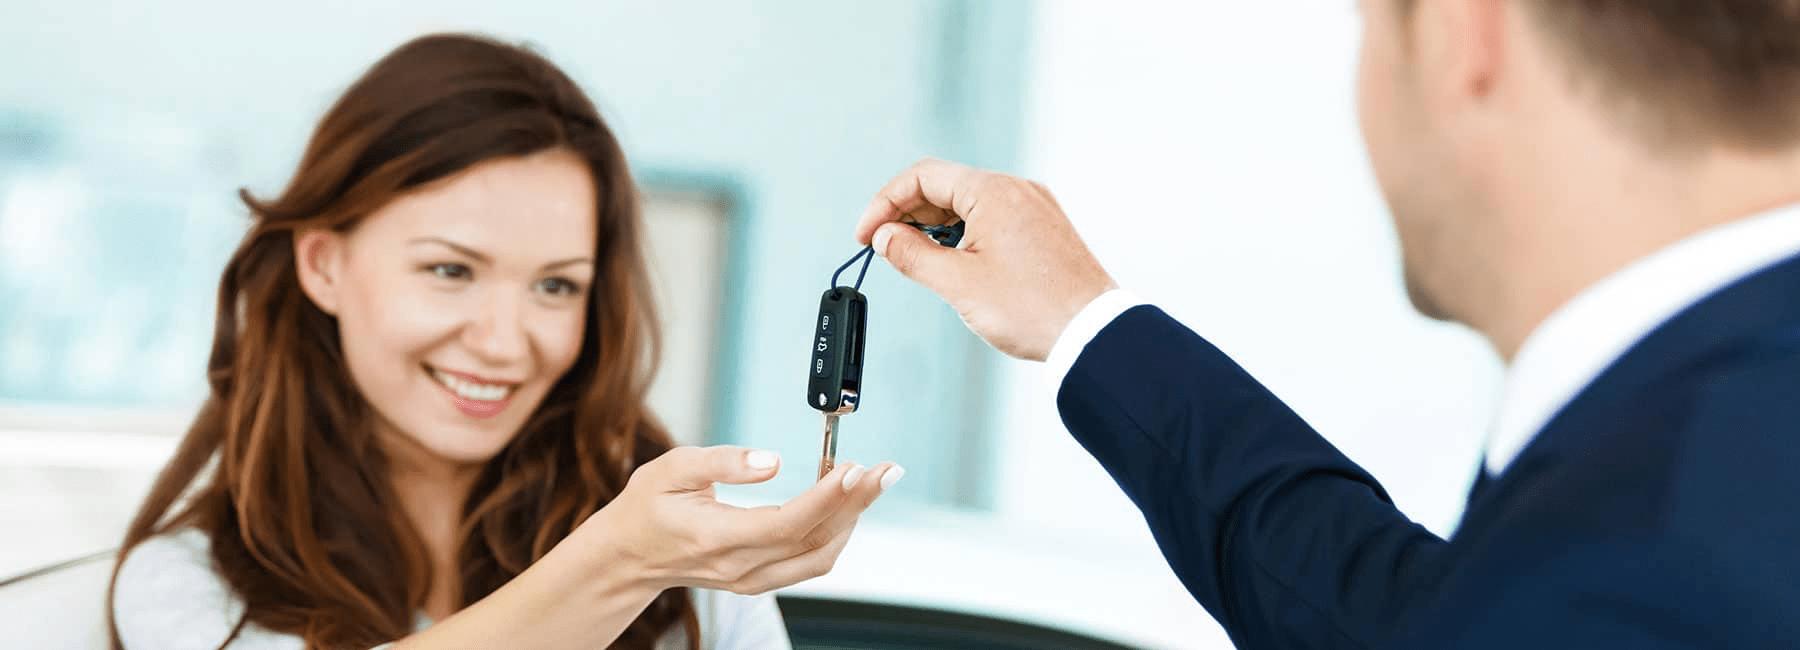 happy woman receives car keys from car dealer